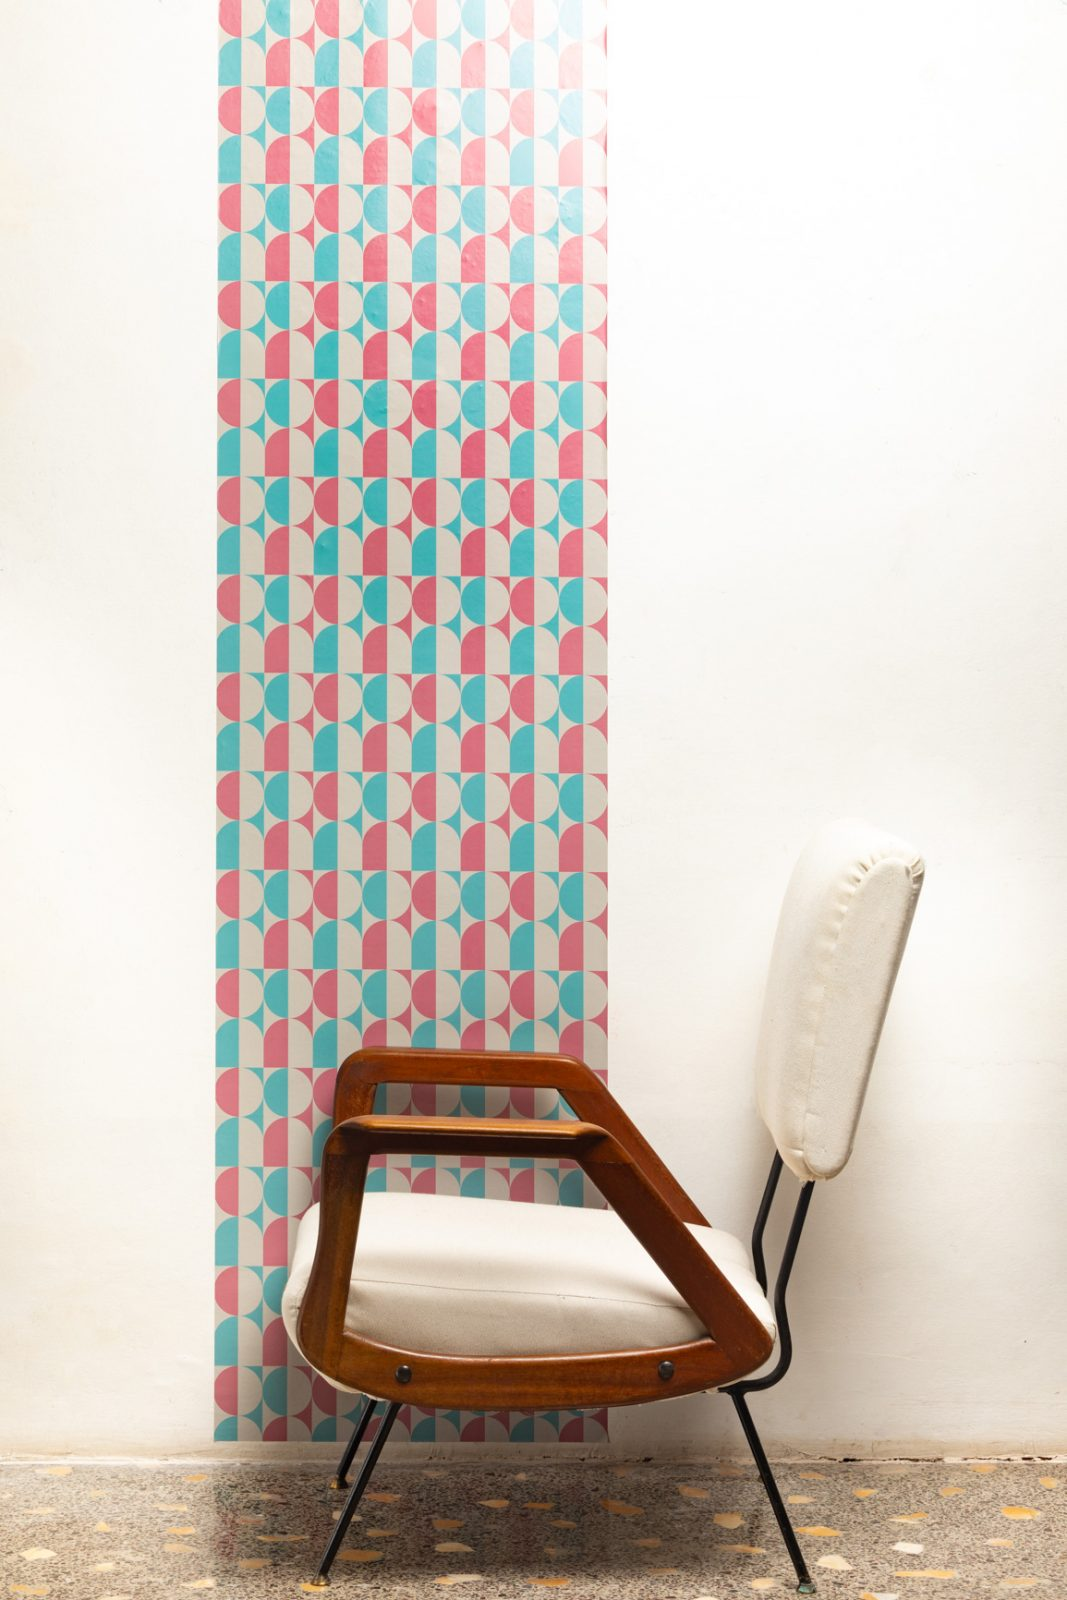 Essenzialmente50 per PPPattern, Stella Orlandino design